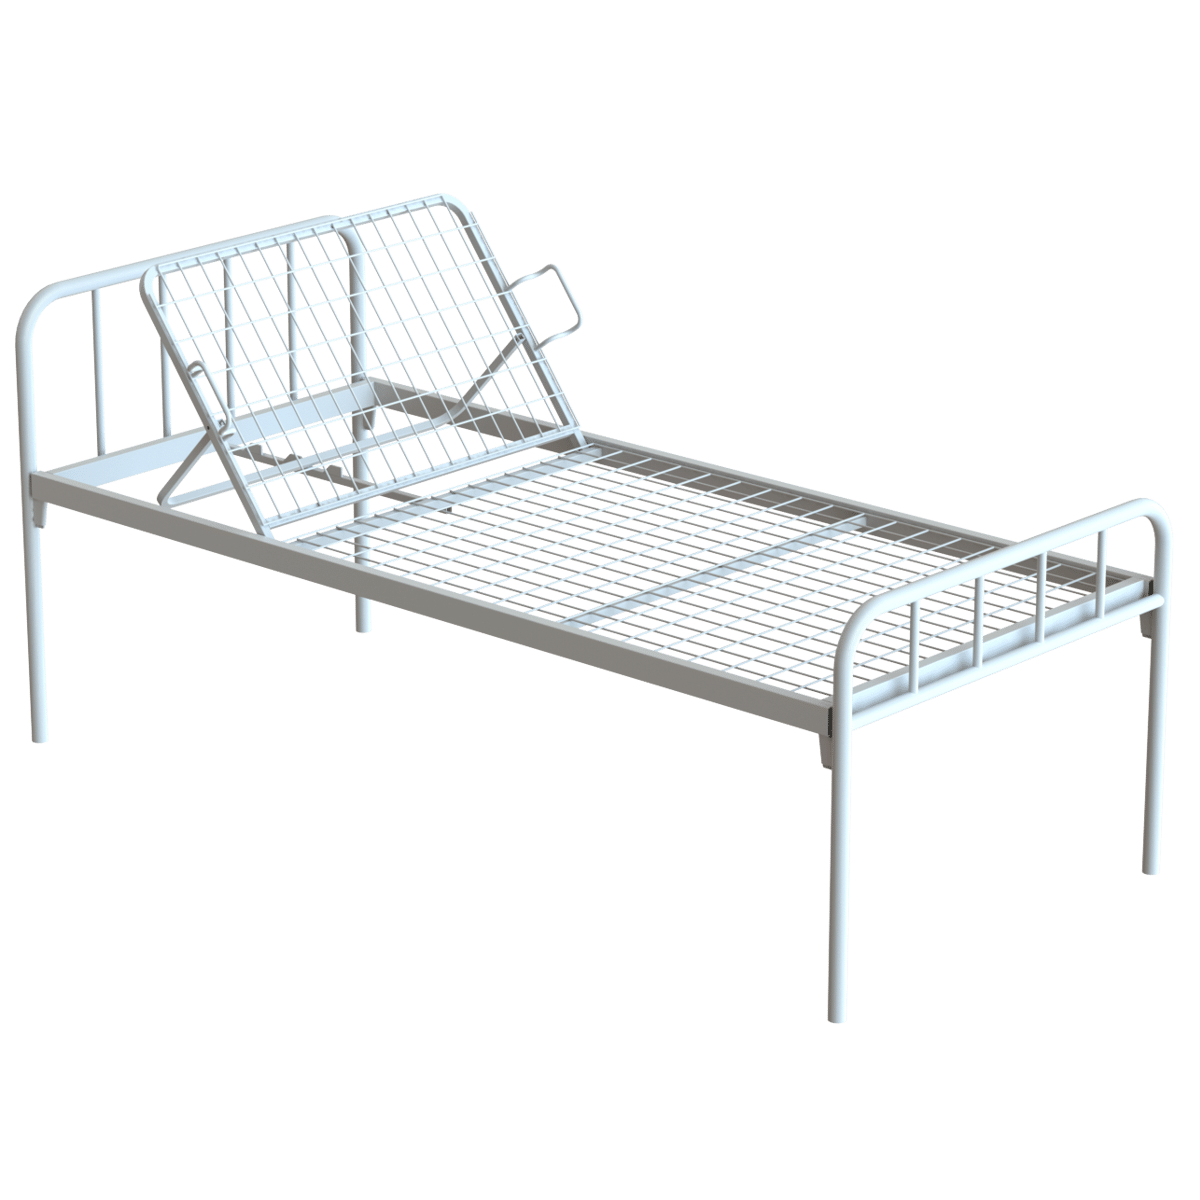 Hospital Bed Headrest Adjustable